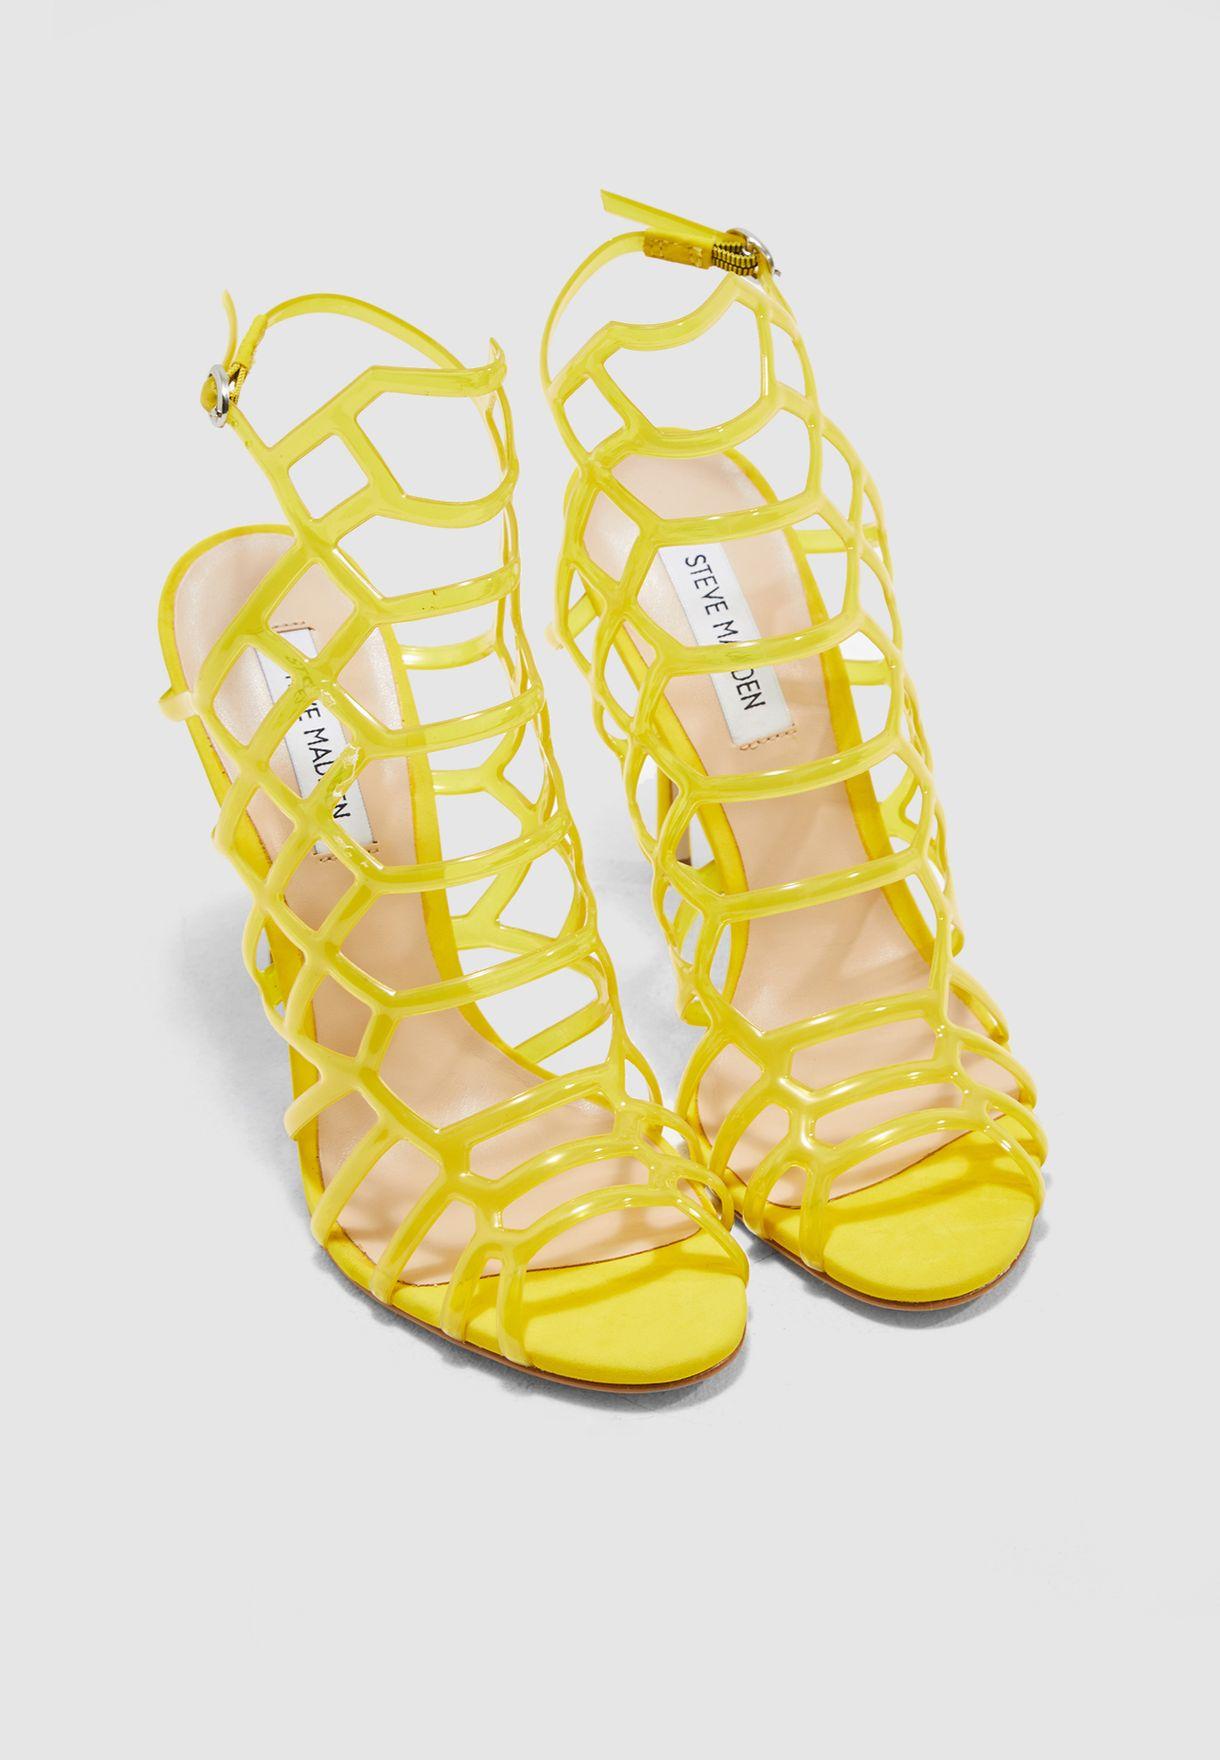 de60460e70e Shop Steve Madden yellow Score Heel Sandal SCORE for Women in ...